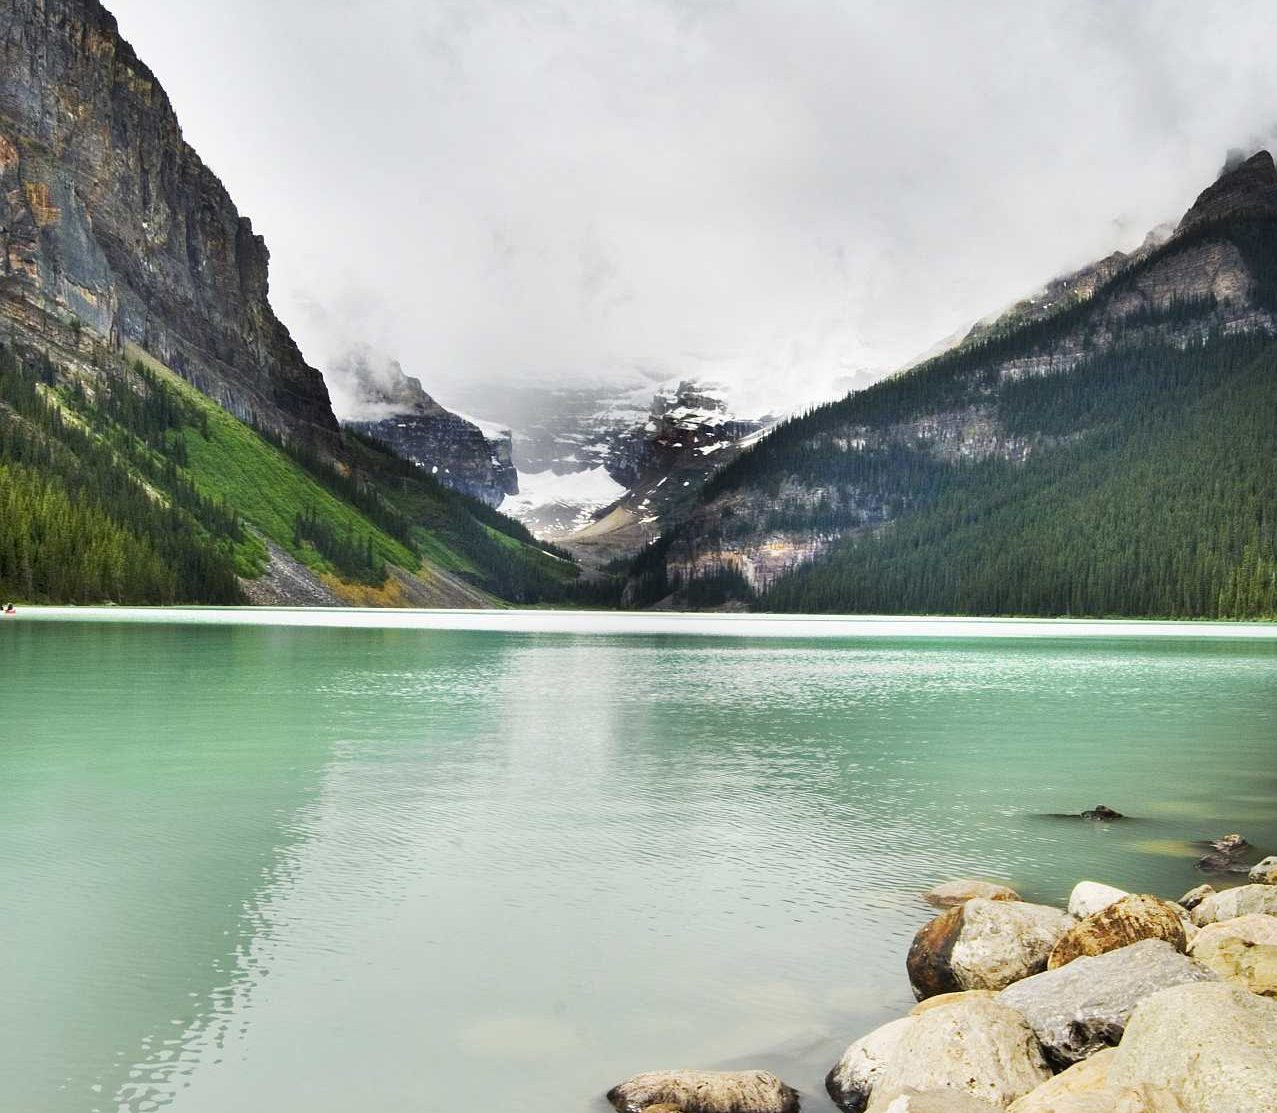 PhotoFly Travel Club | Lake Louise | PhotoFly Travel Club